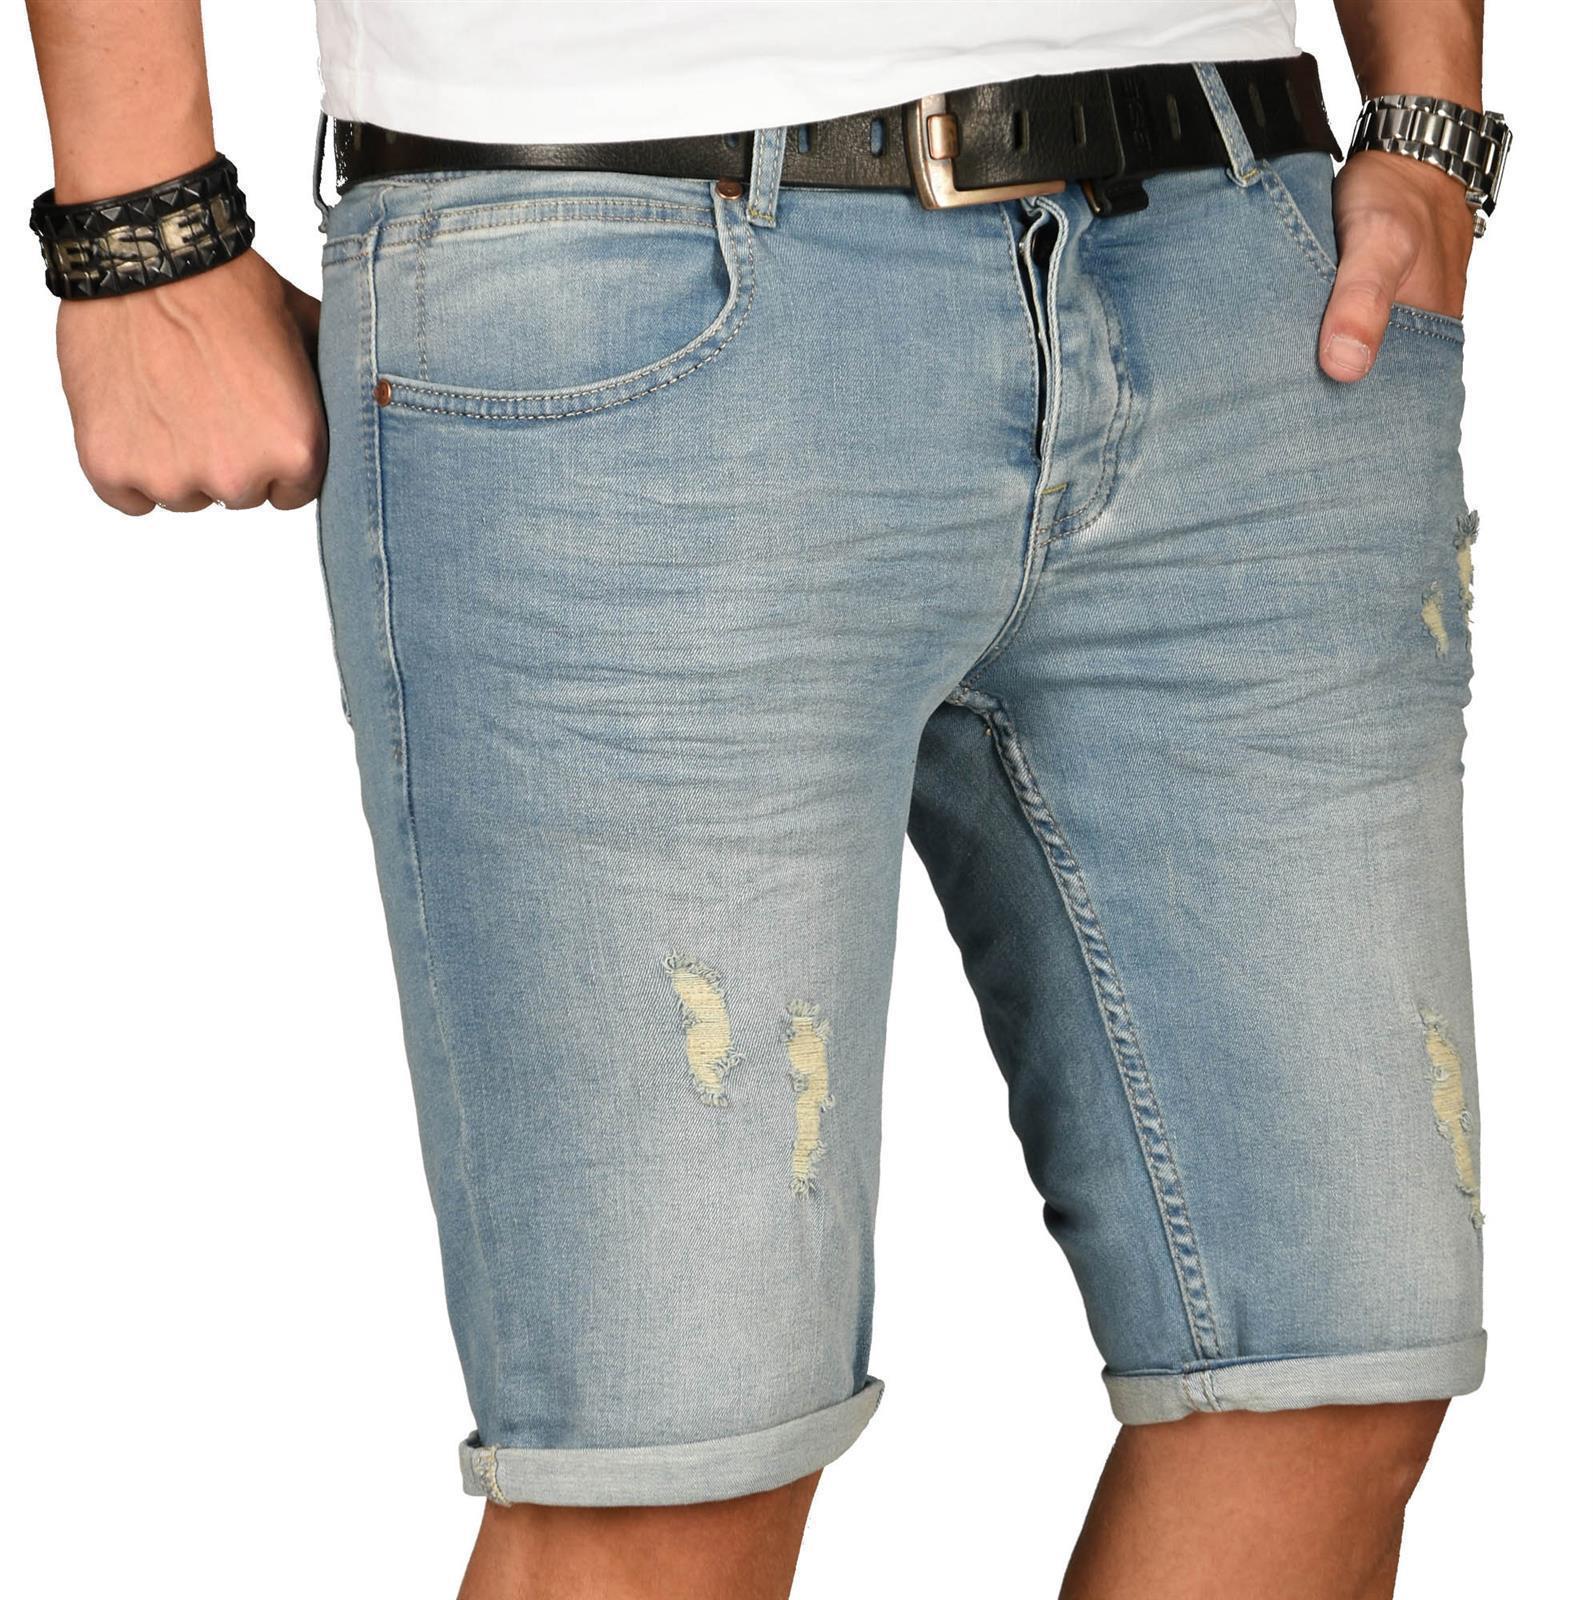 A-Salvarini-Herren-Designer-Jeans-Short-kurze-Hose-Slim-Sommer-Shorts-Washed Indexbild 23